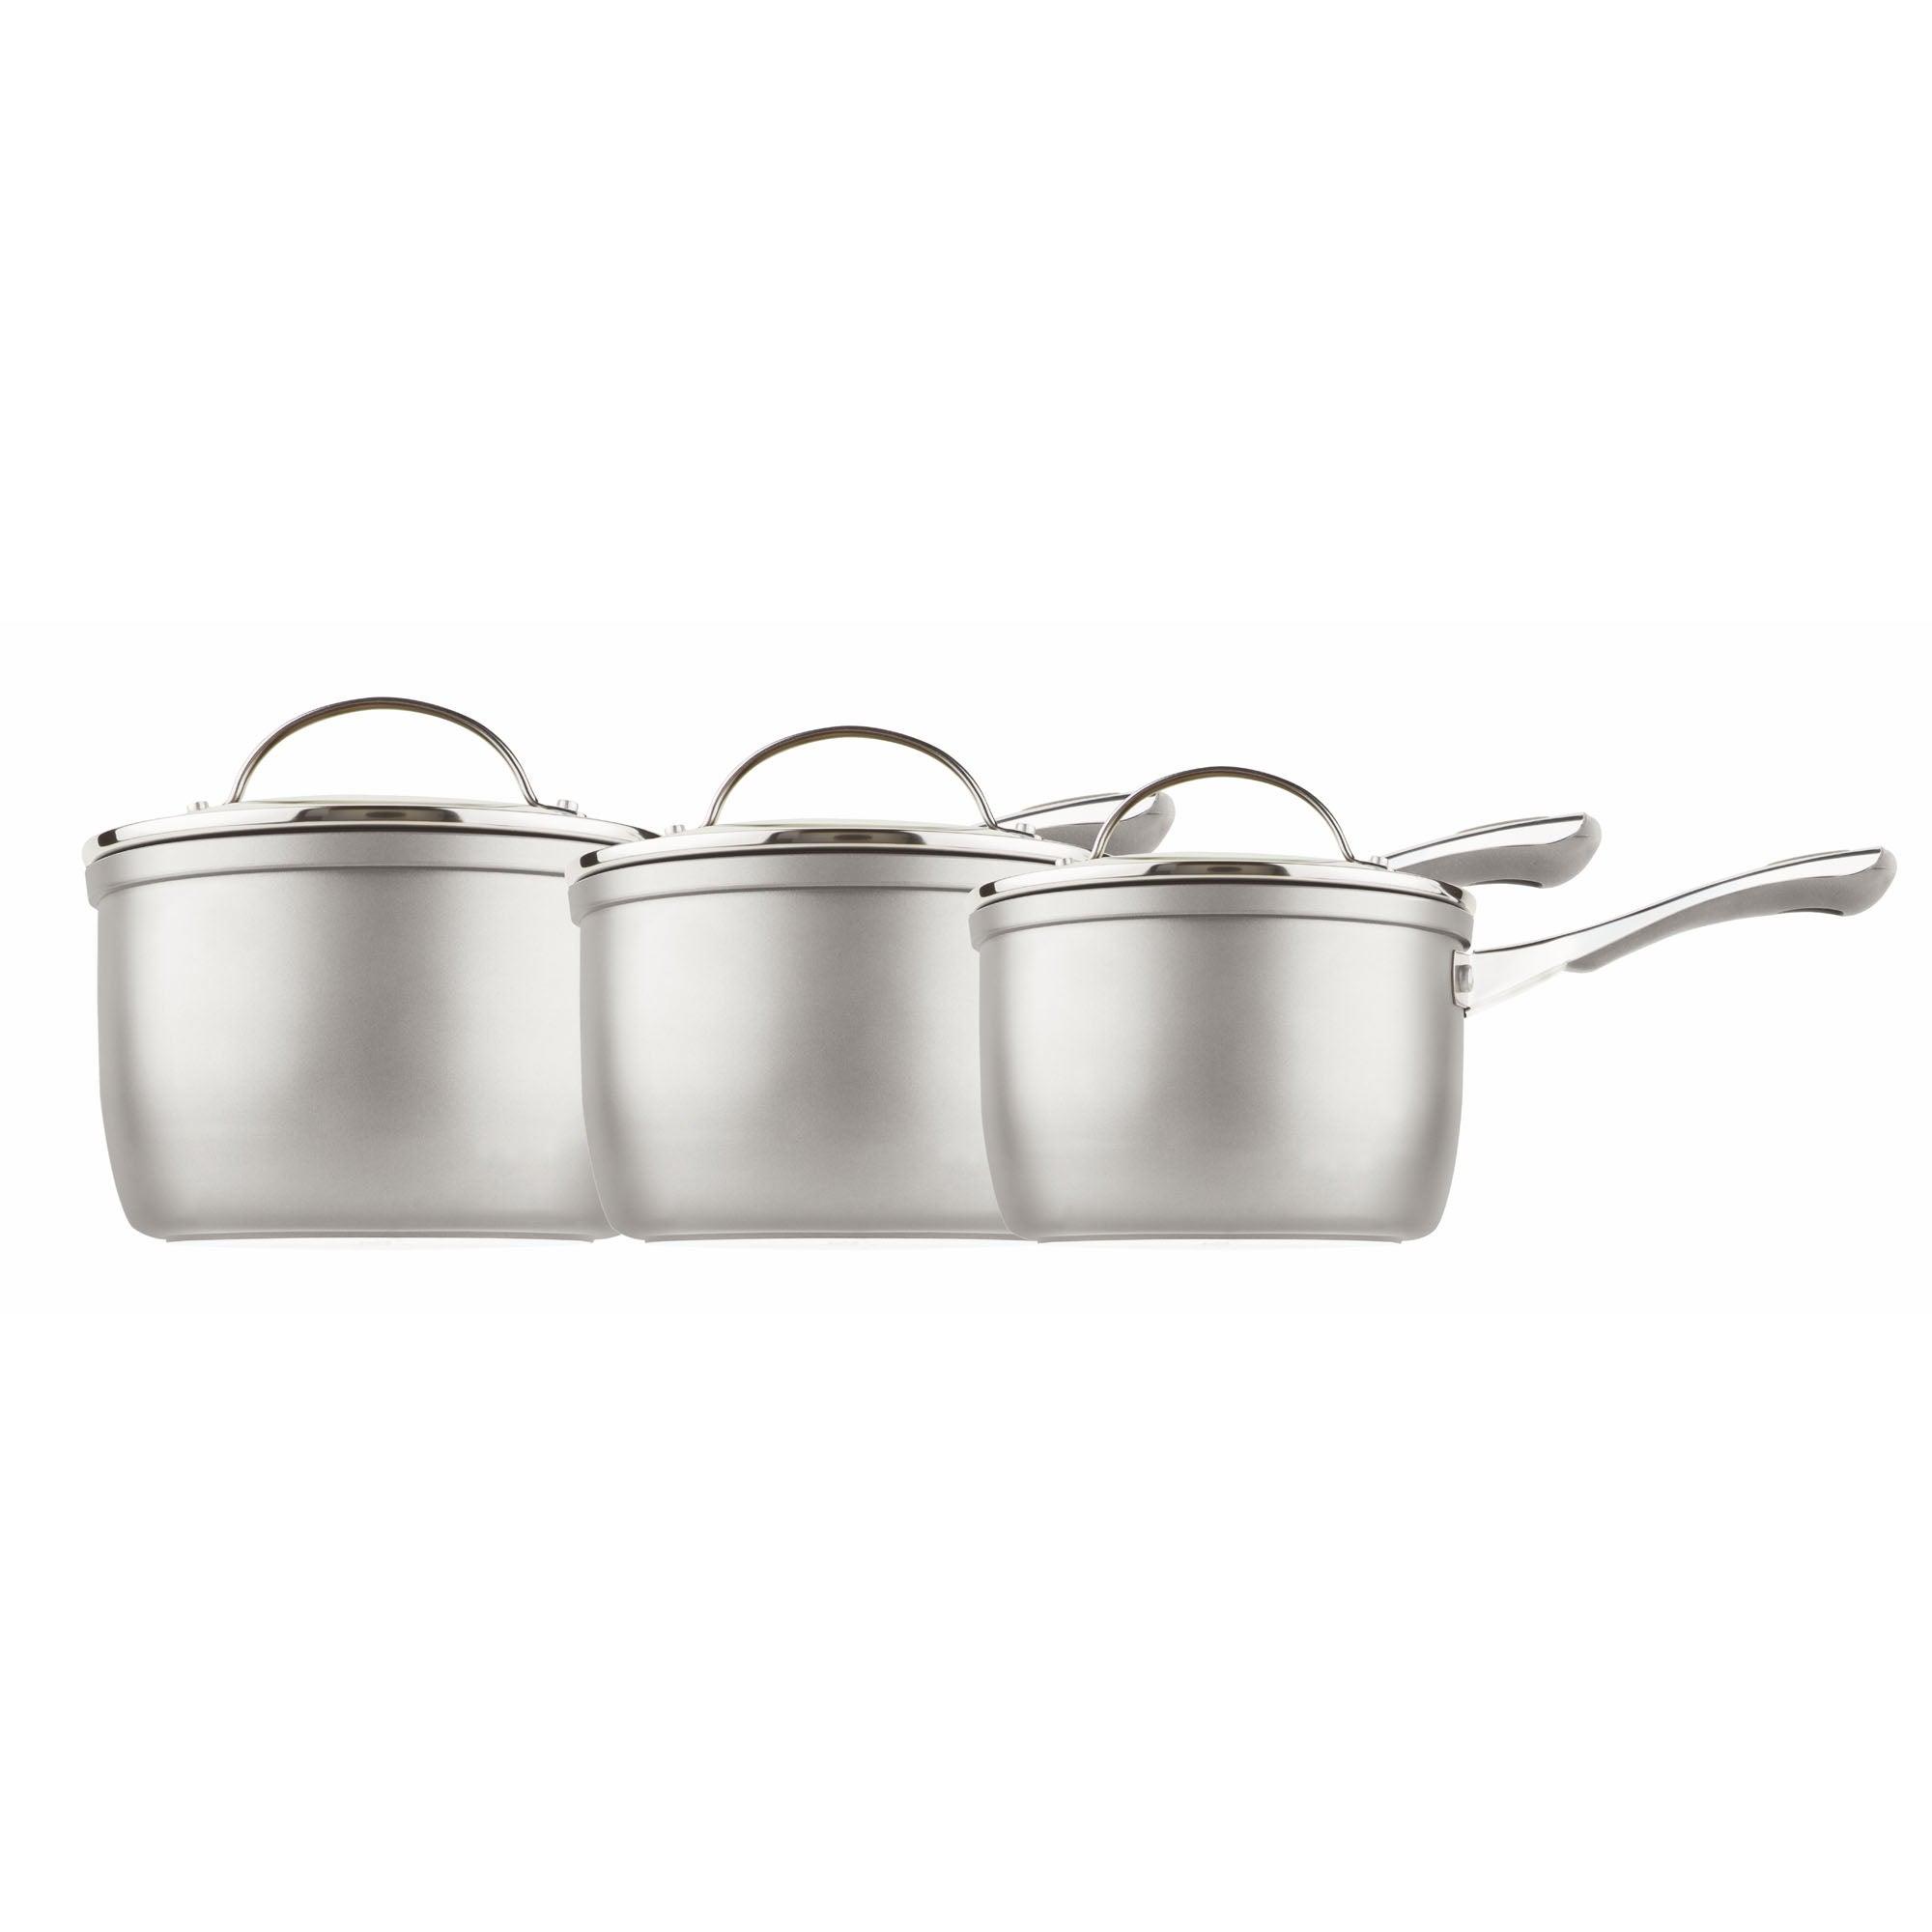 Prestige Prestige Prism Induction Aluminium Saucepan, Silver, 14 cm, 16 cm and 18 cm, Set of 3